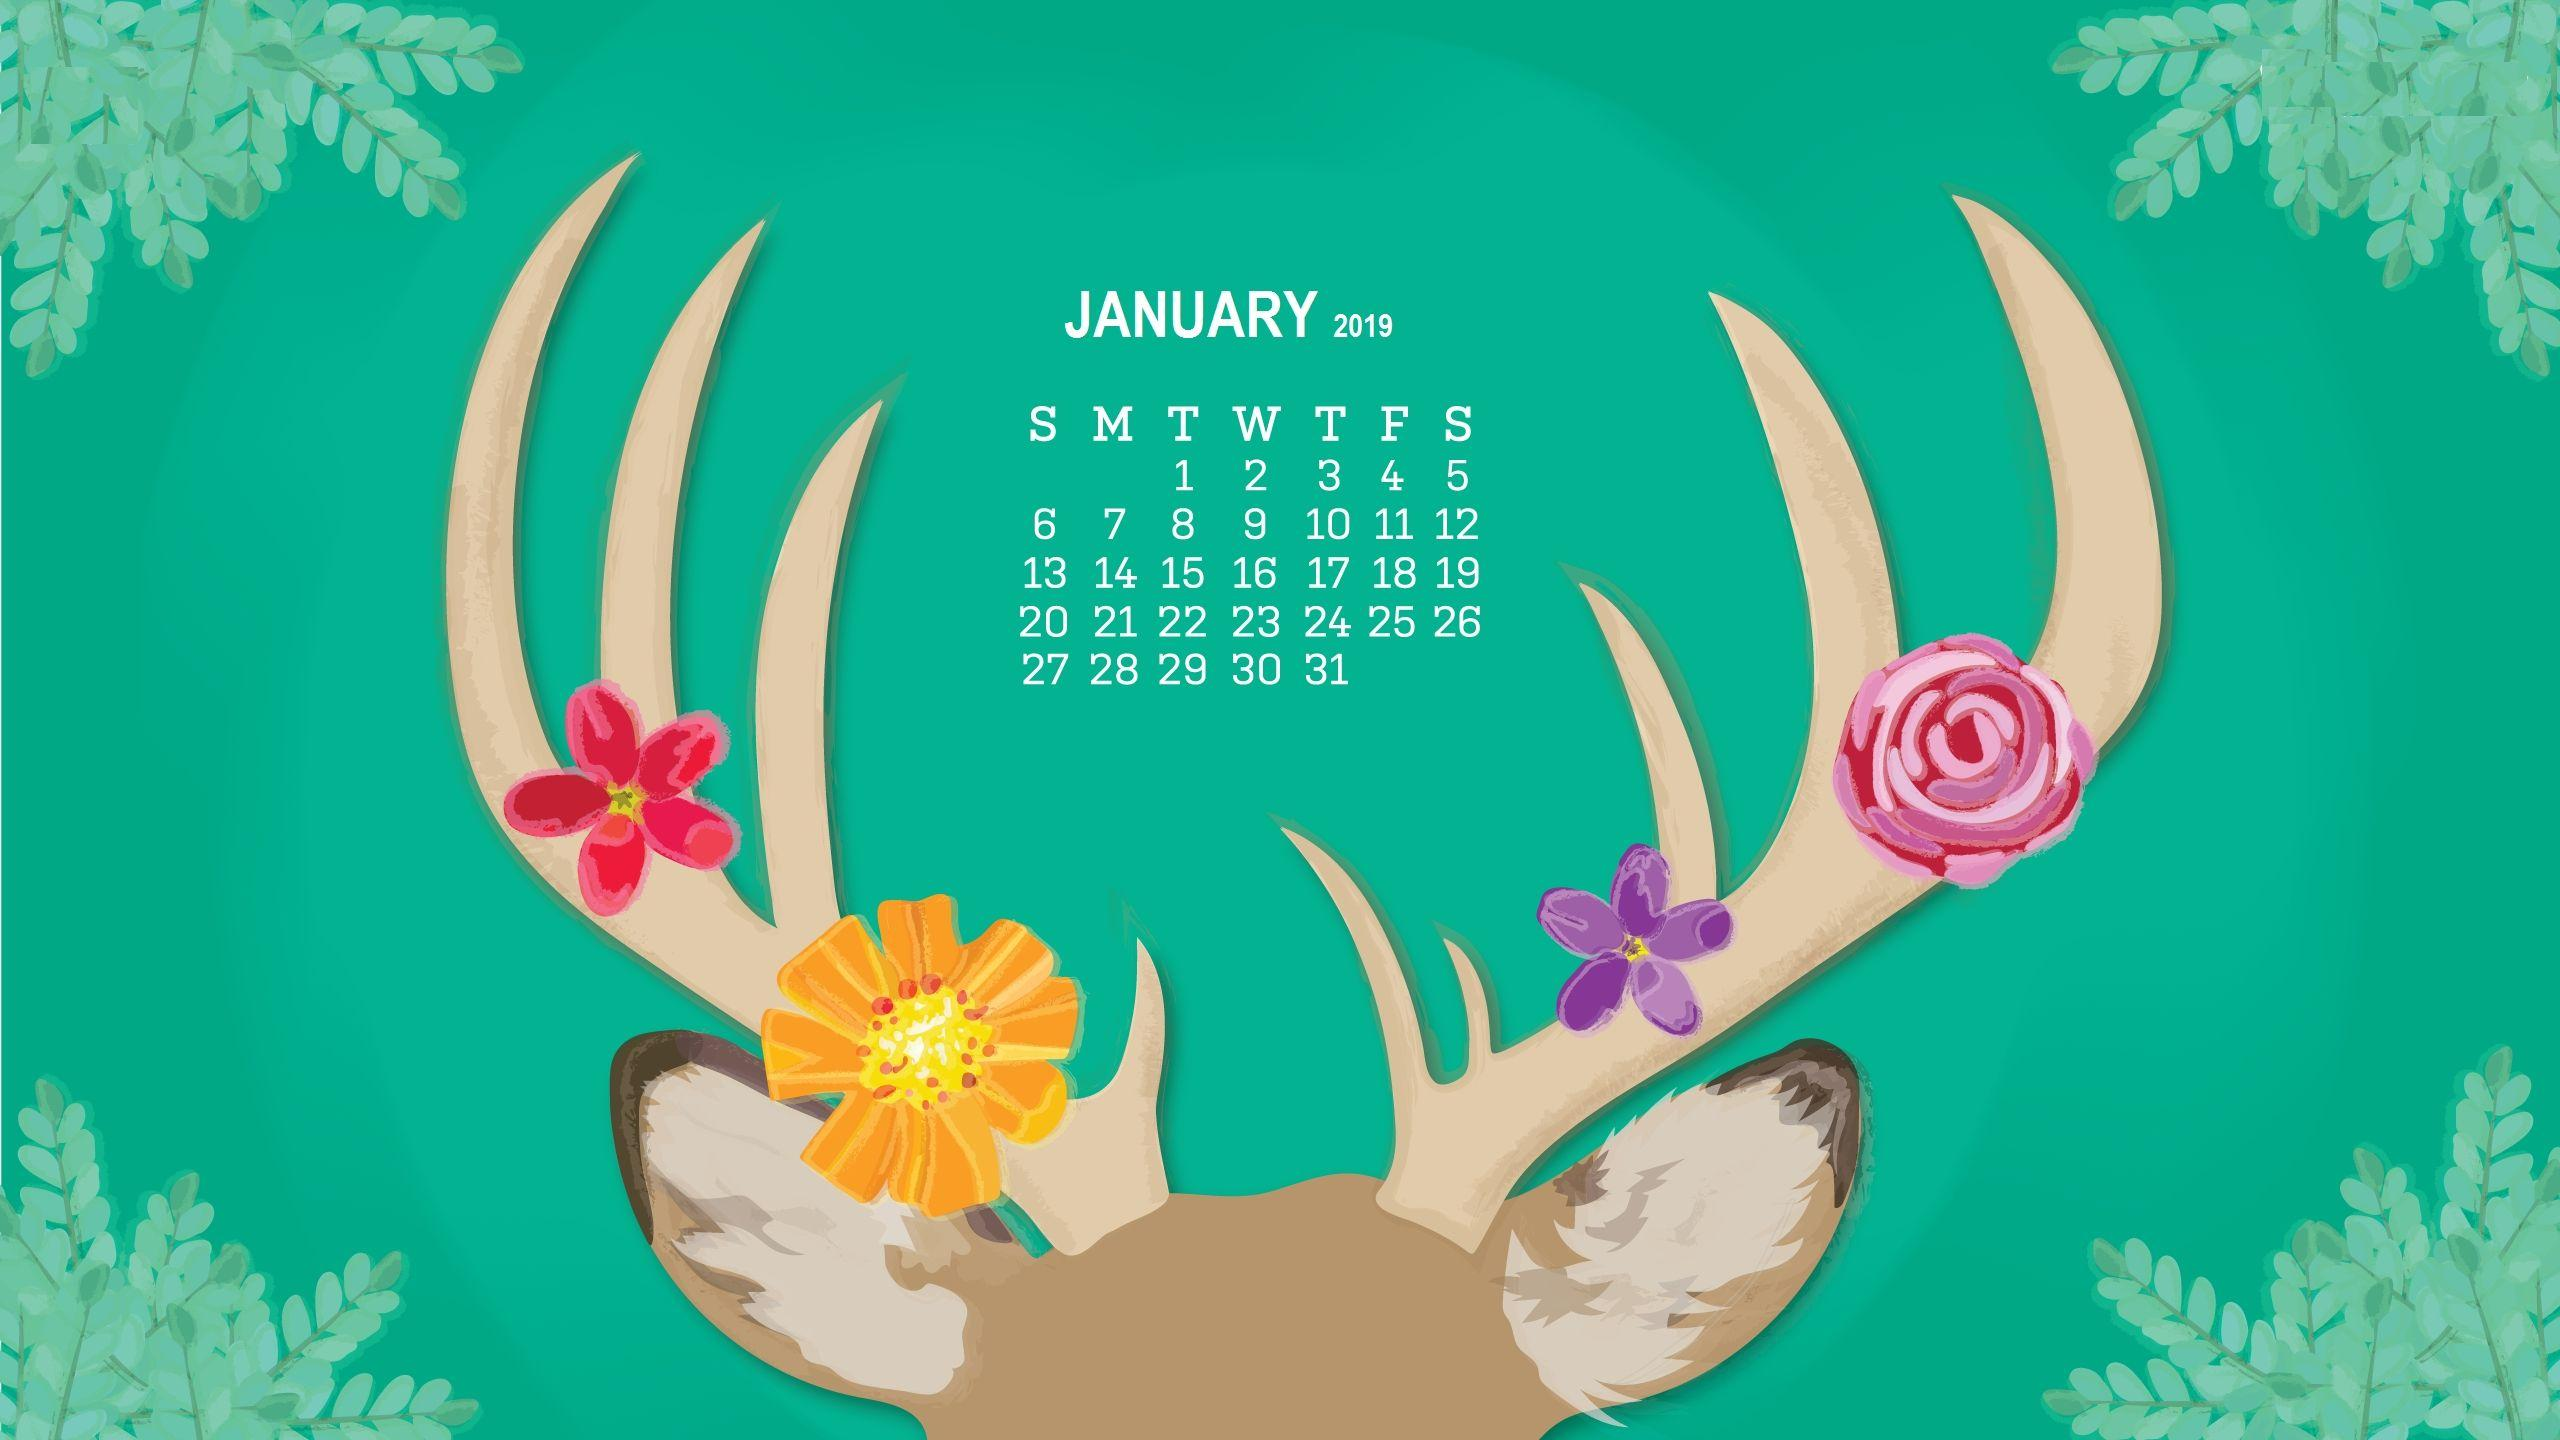 January 2019 Calendar Wallpapers  Wallpaper Cave